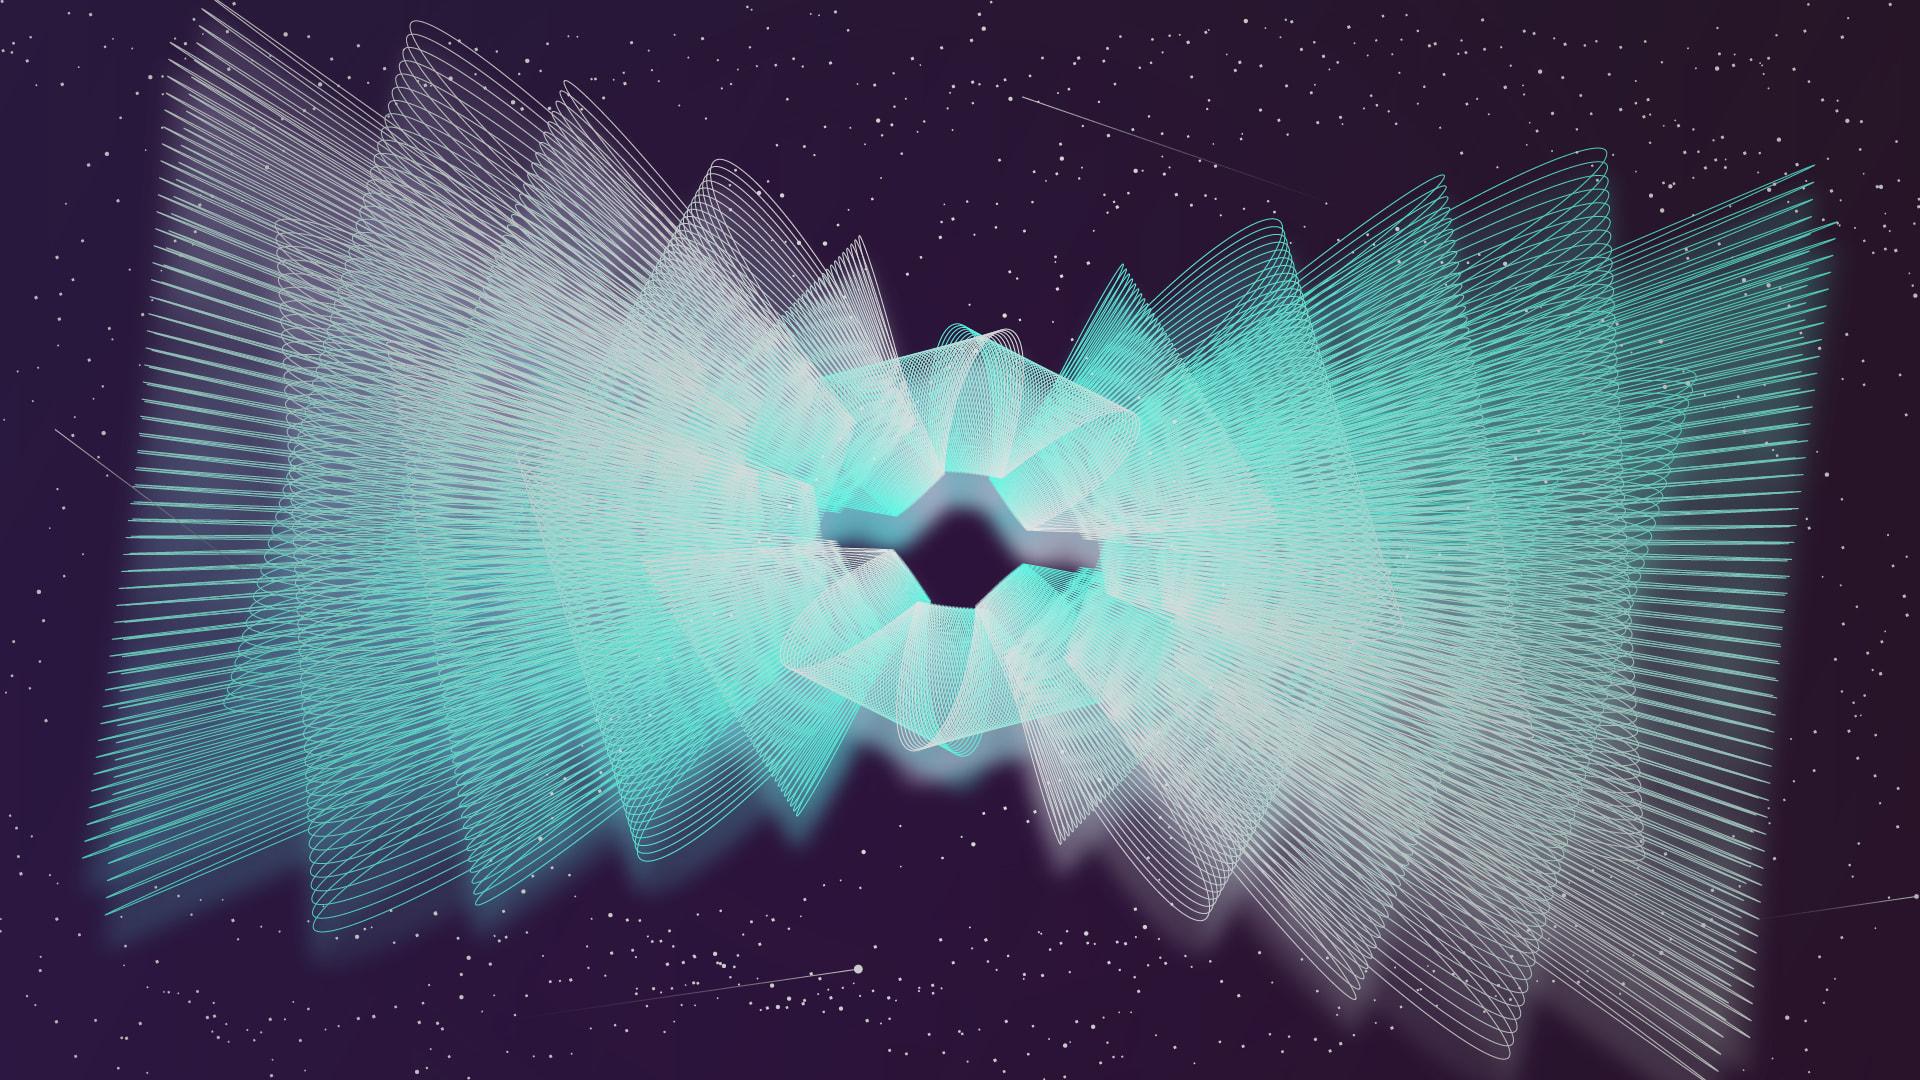 4k Space Themed Wallpaper By Joshlighten